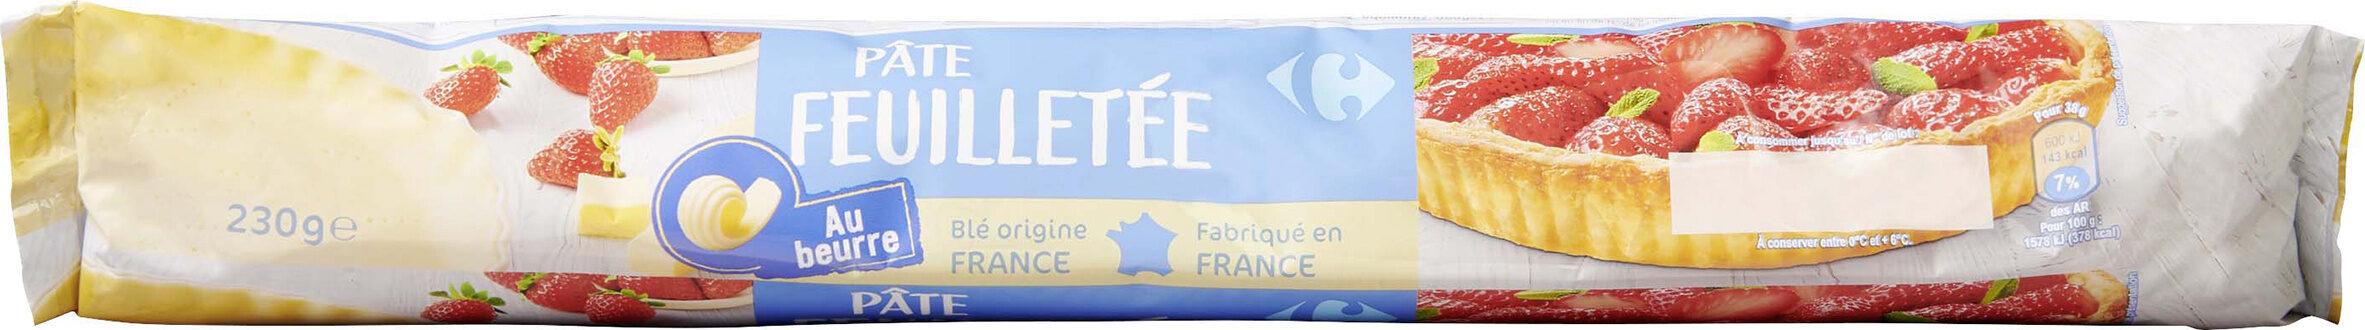 Pâte feuilletée - Prodotto - fr